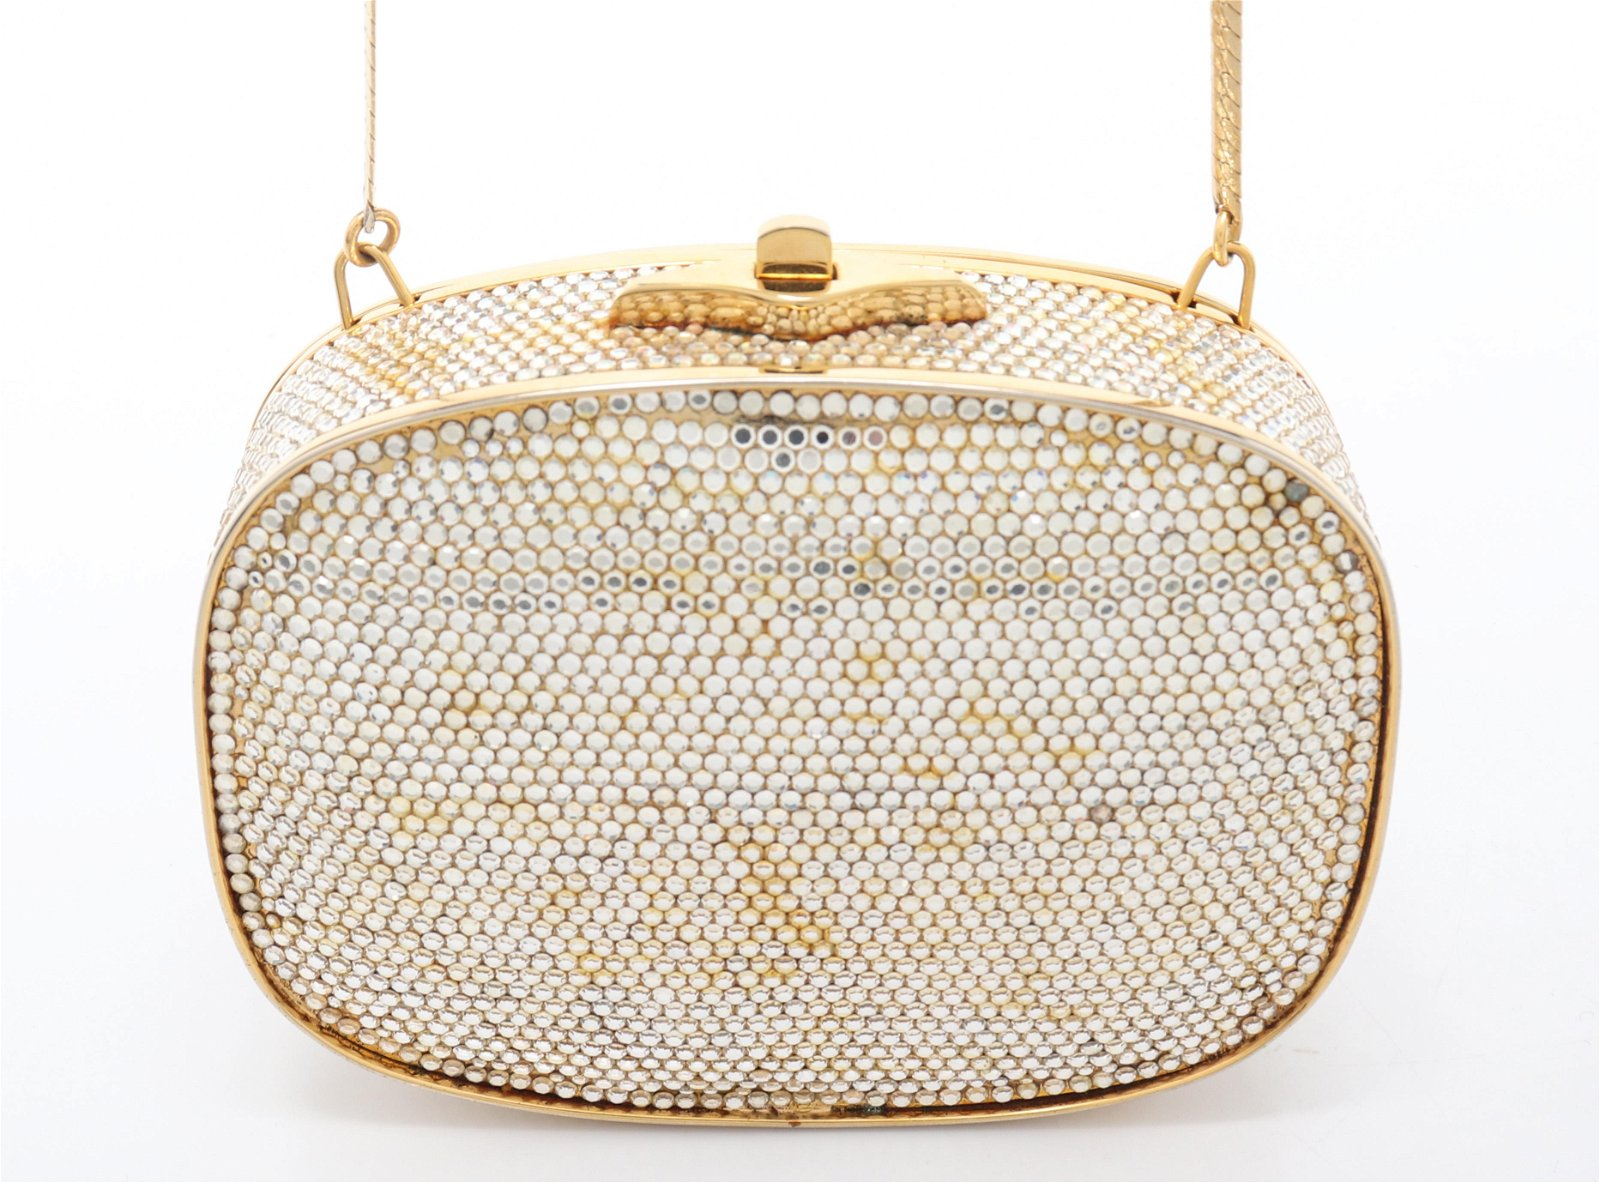 Judith Leiber Rhinestone Minaudiere Evening Bag